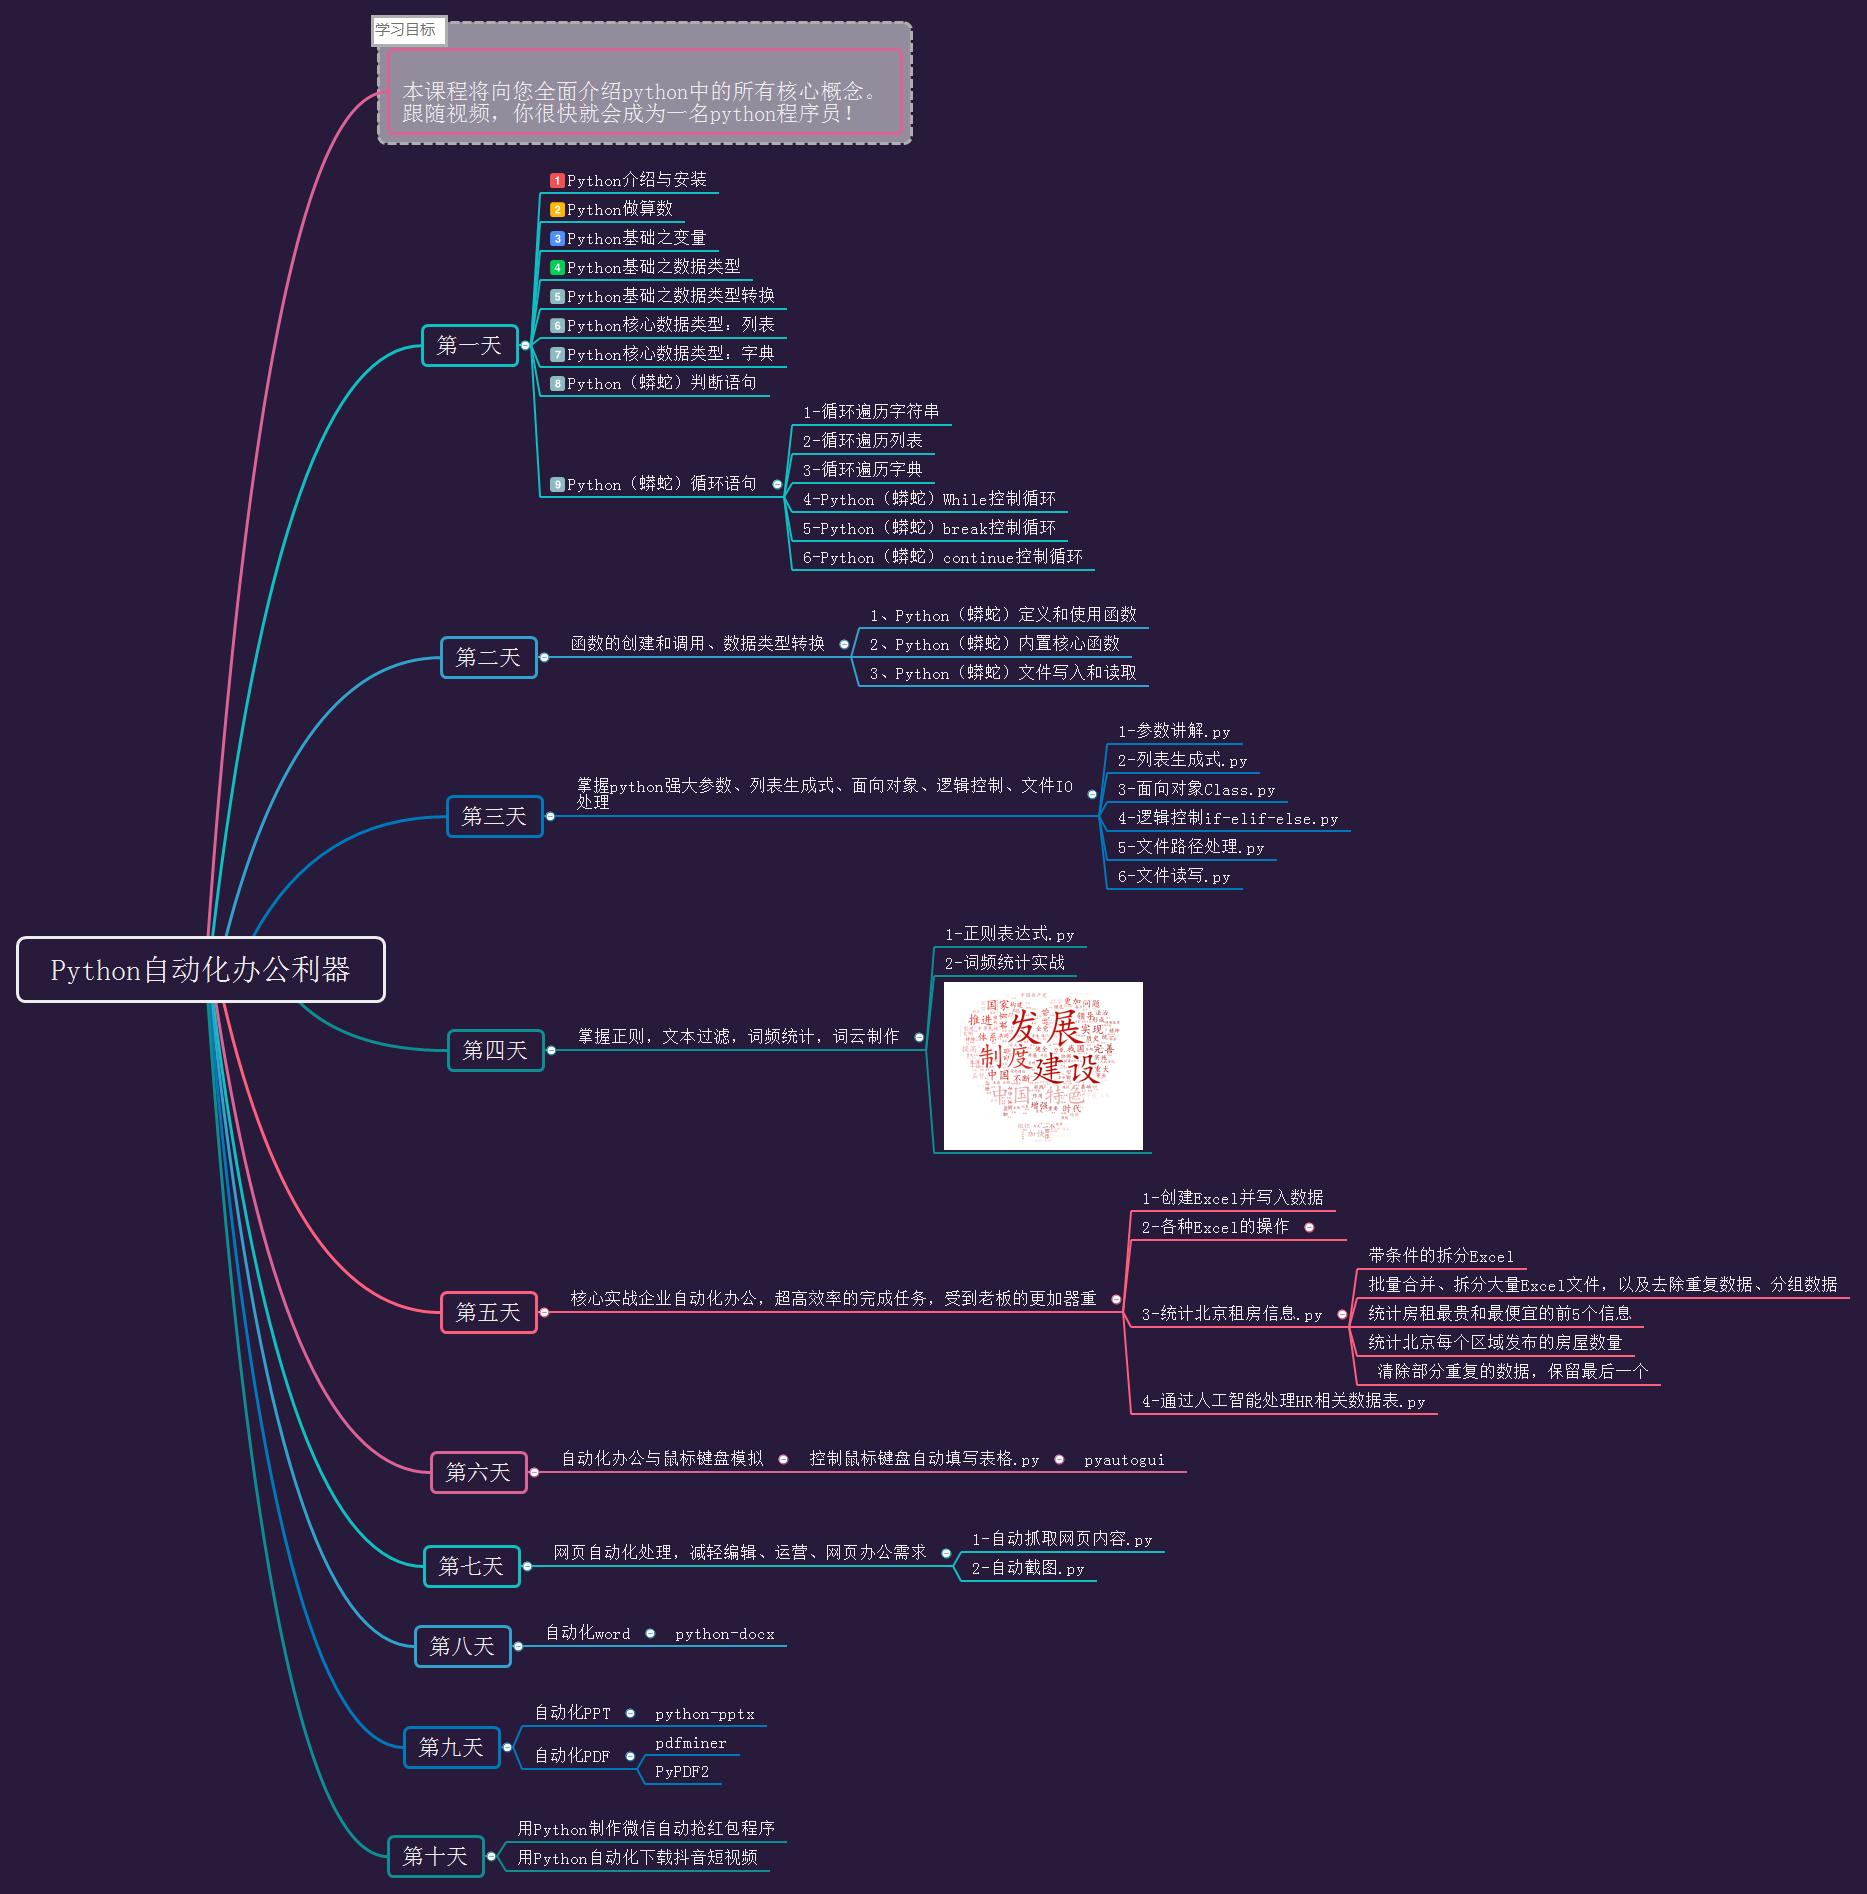 Python自动化办公利器.png